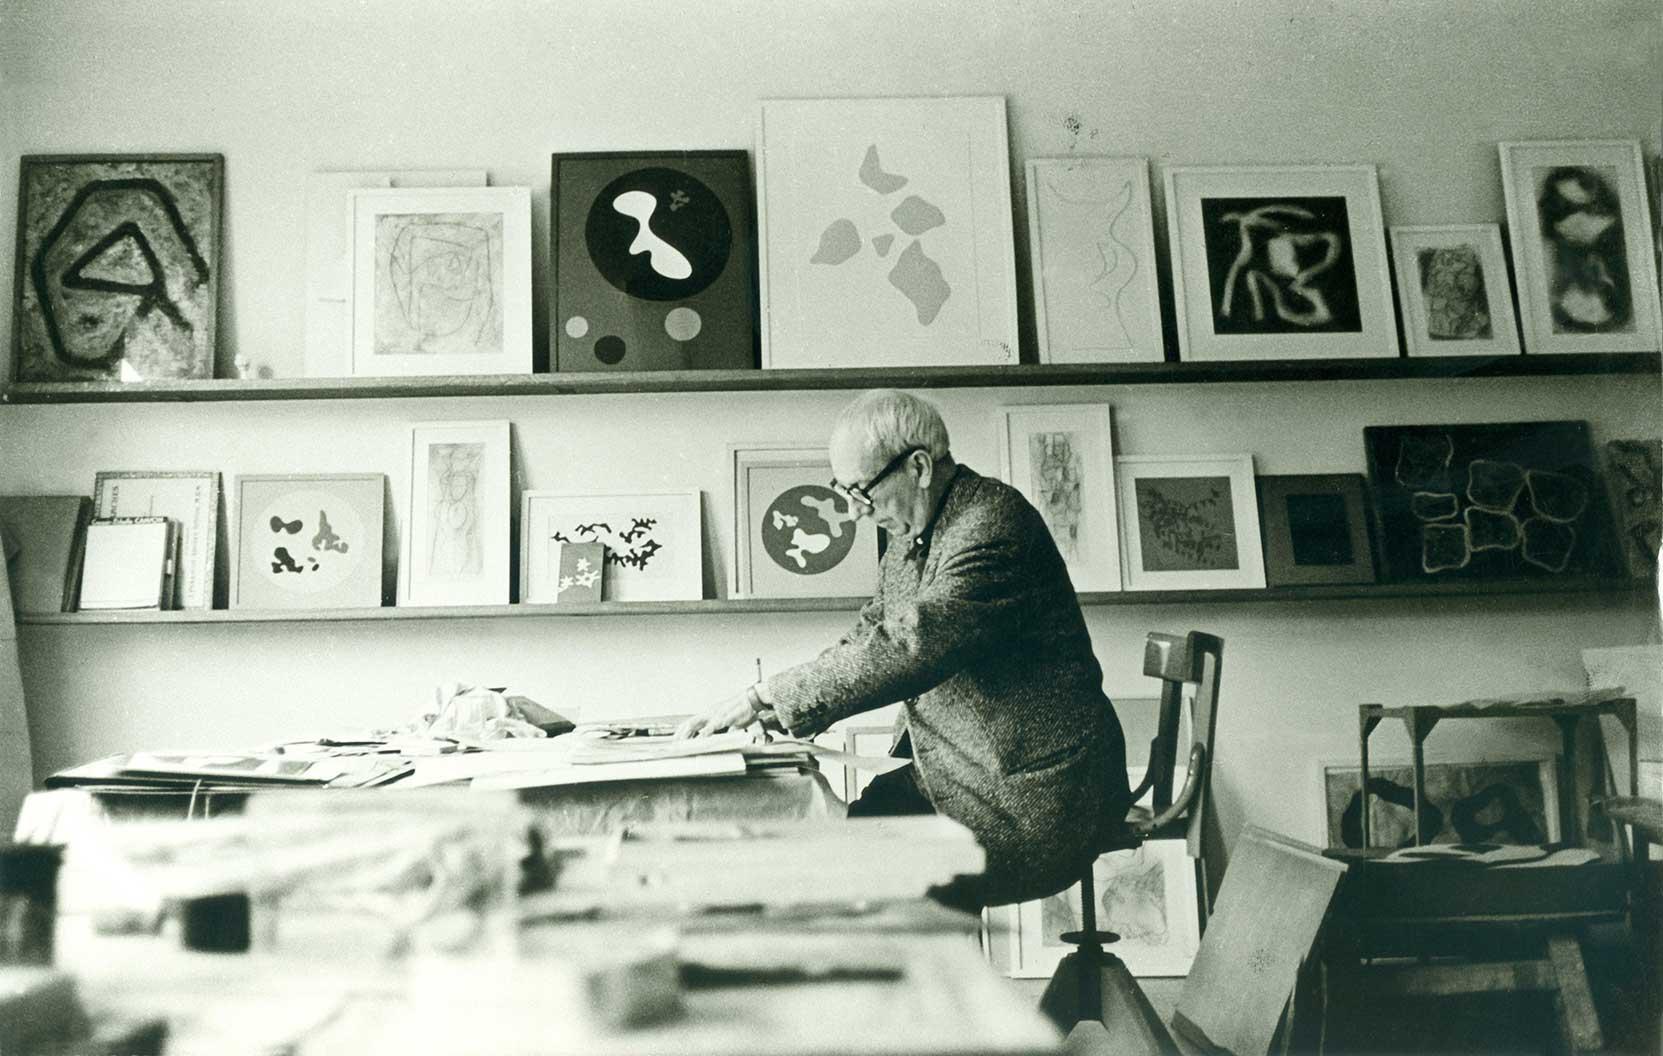 Hans Arp in his studio in Clamart, c. 1962 (Photograph: André Morain)